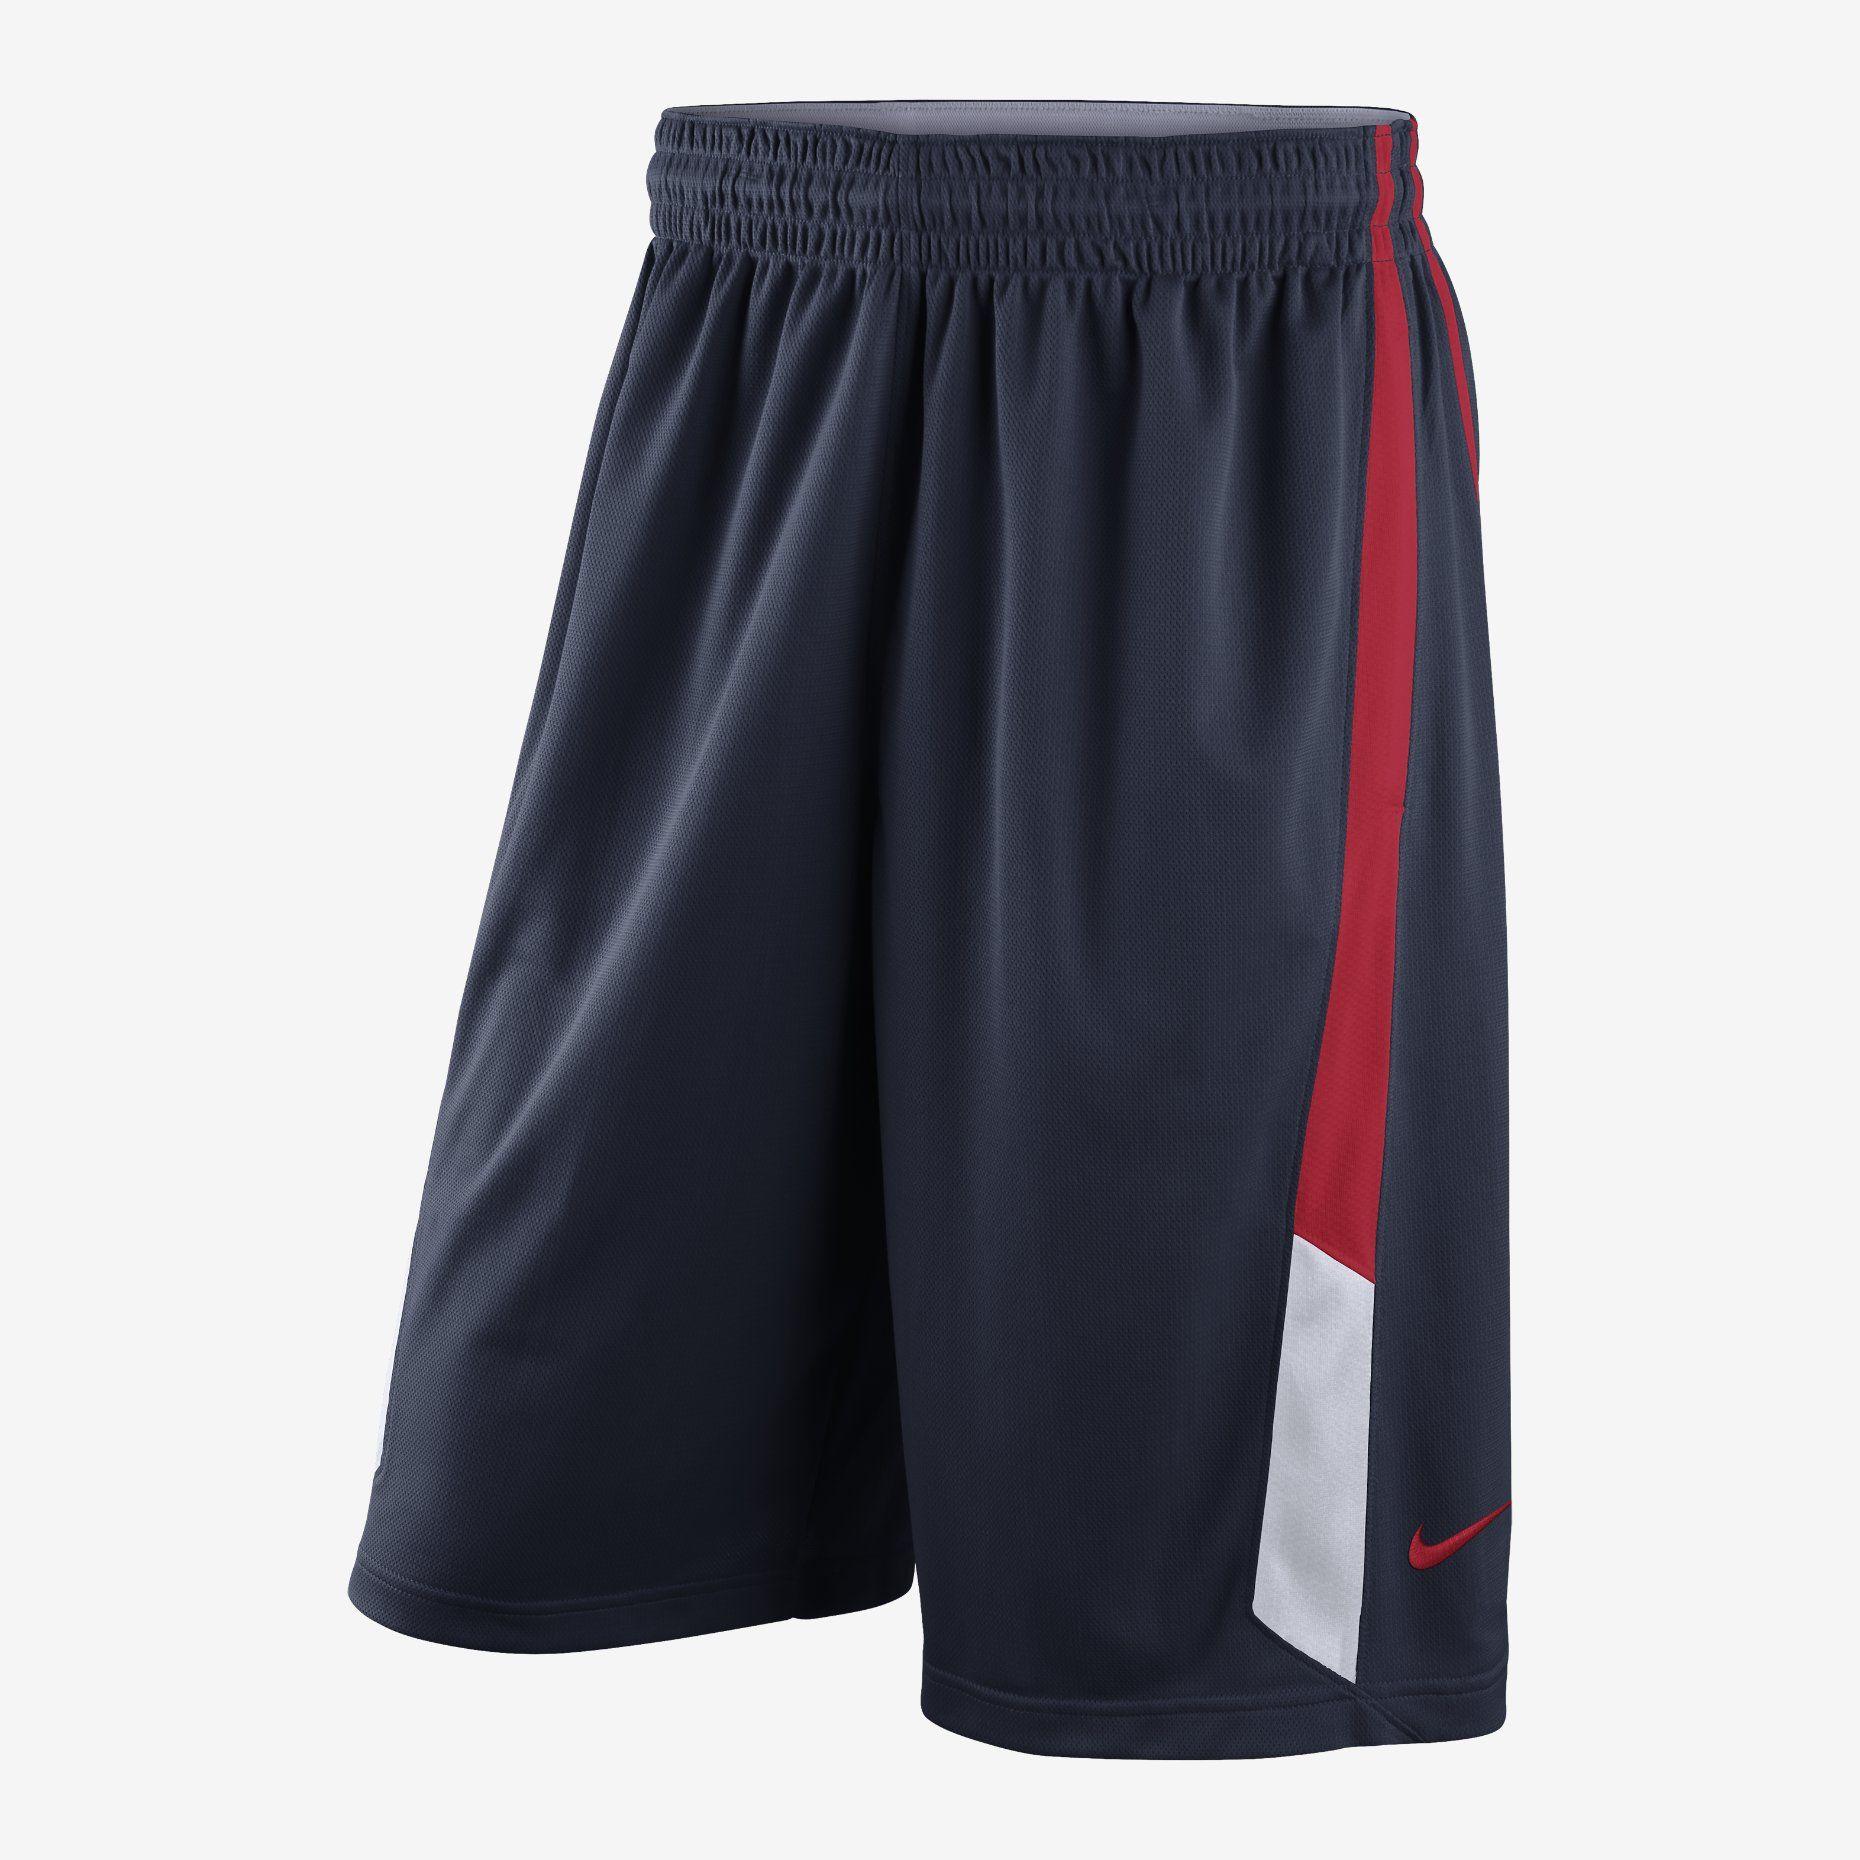 Nike Dri Fit Arizona Men S Basketball Shorts 40 Gym Men Nike Dri Fit Men